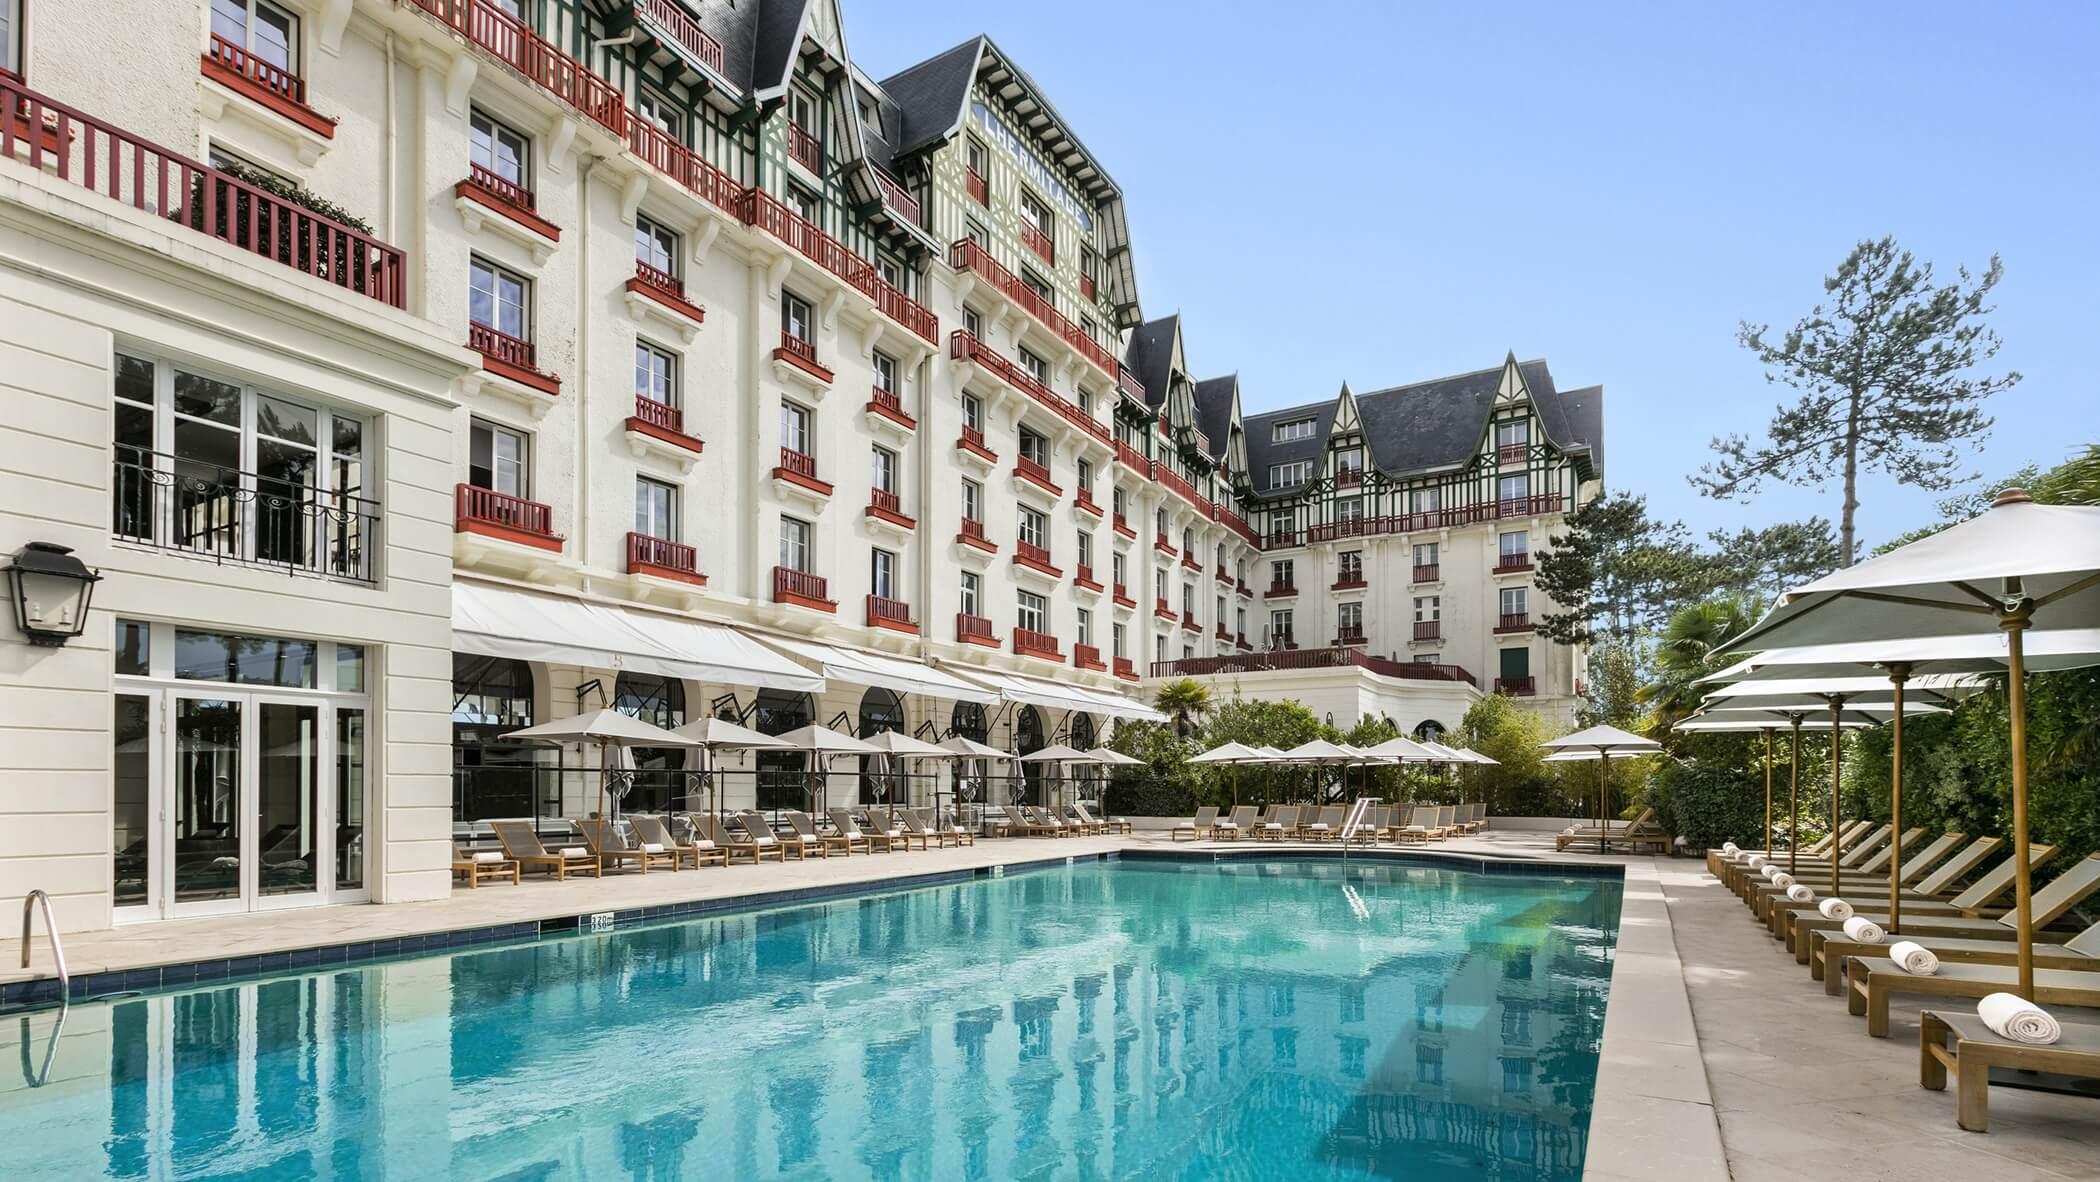 Barrière Hotel l'Hermitage swimming pool